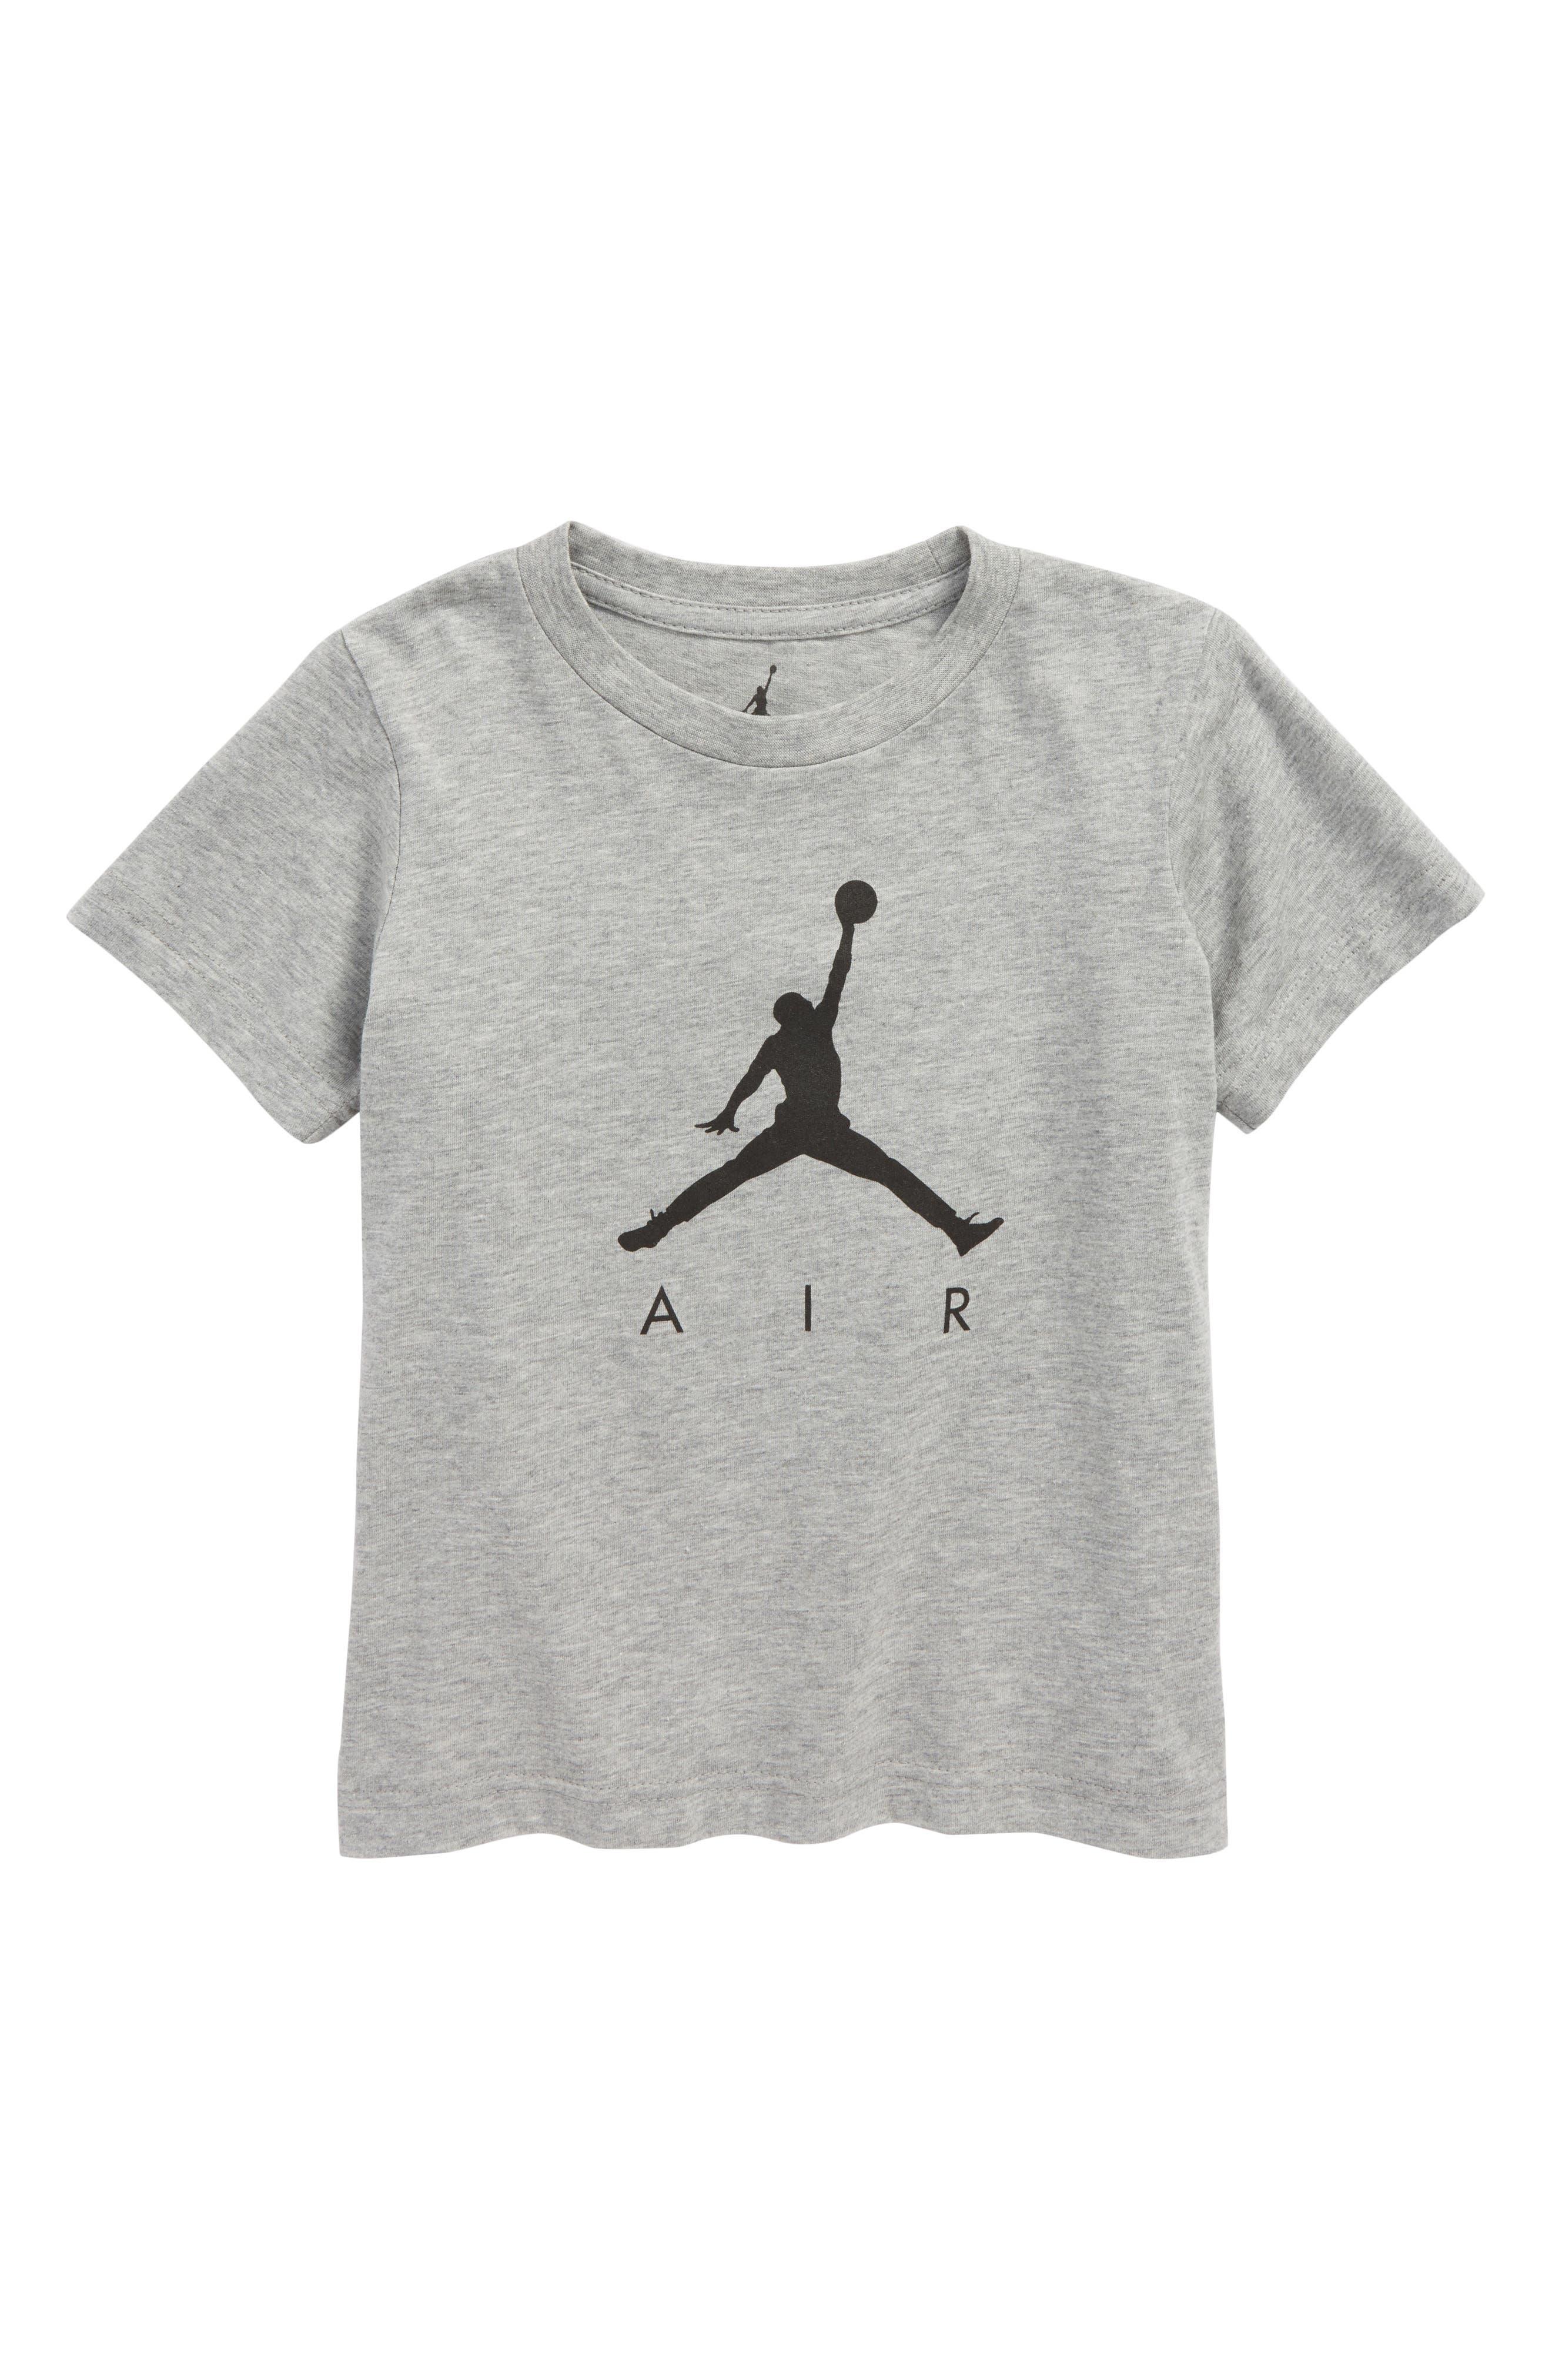 Jordan AJ3 Graphic T-Shirt,                             Main thumbnail 1, color,                             020